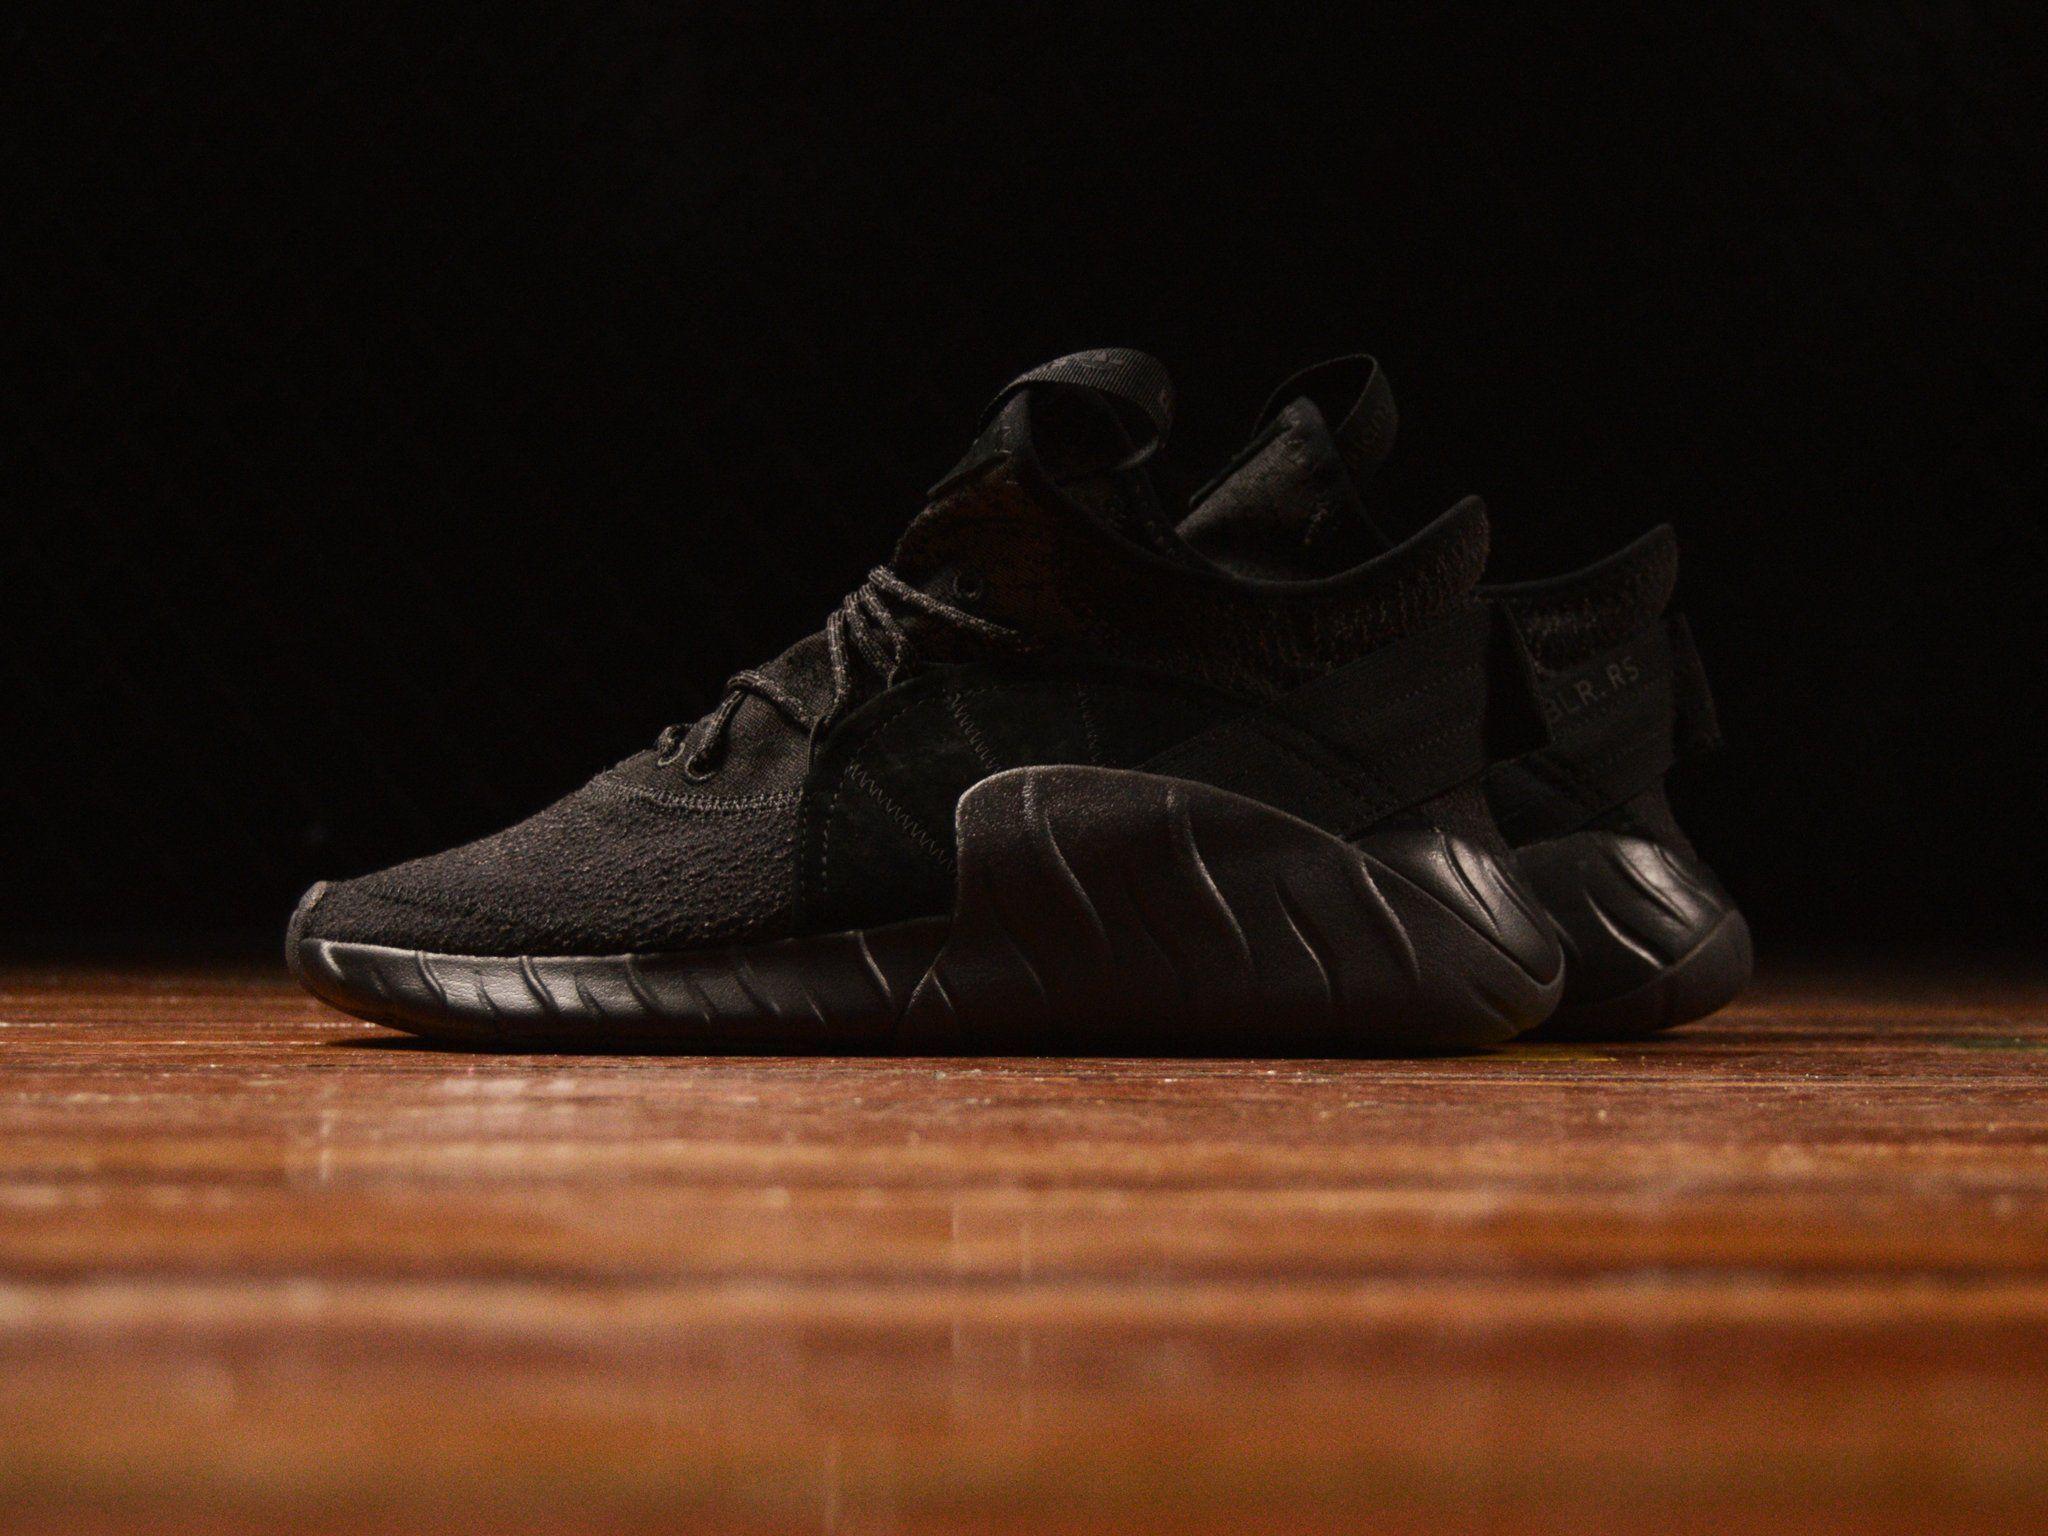 best service 46849 833f4 Men's Adidas Tubular Rise [BY3557] | Adidas | Adidas shoes ...